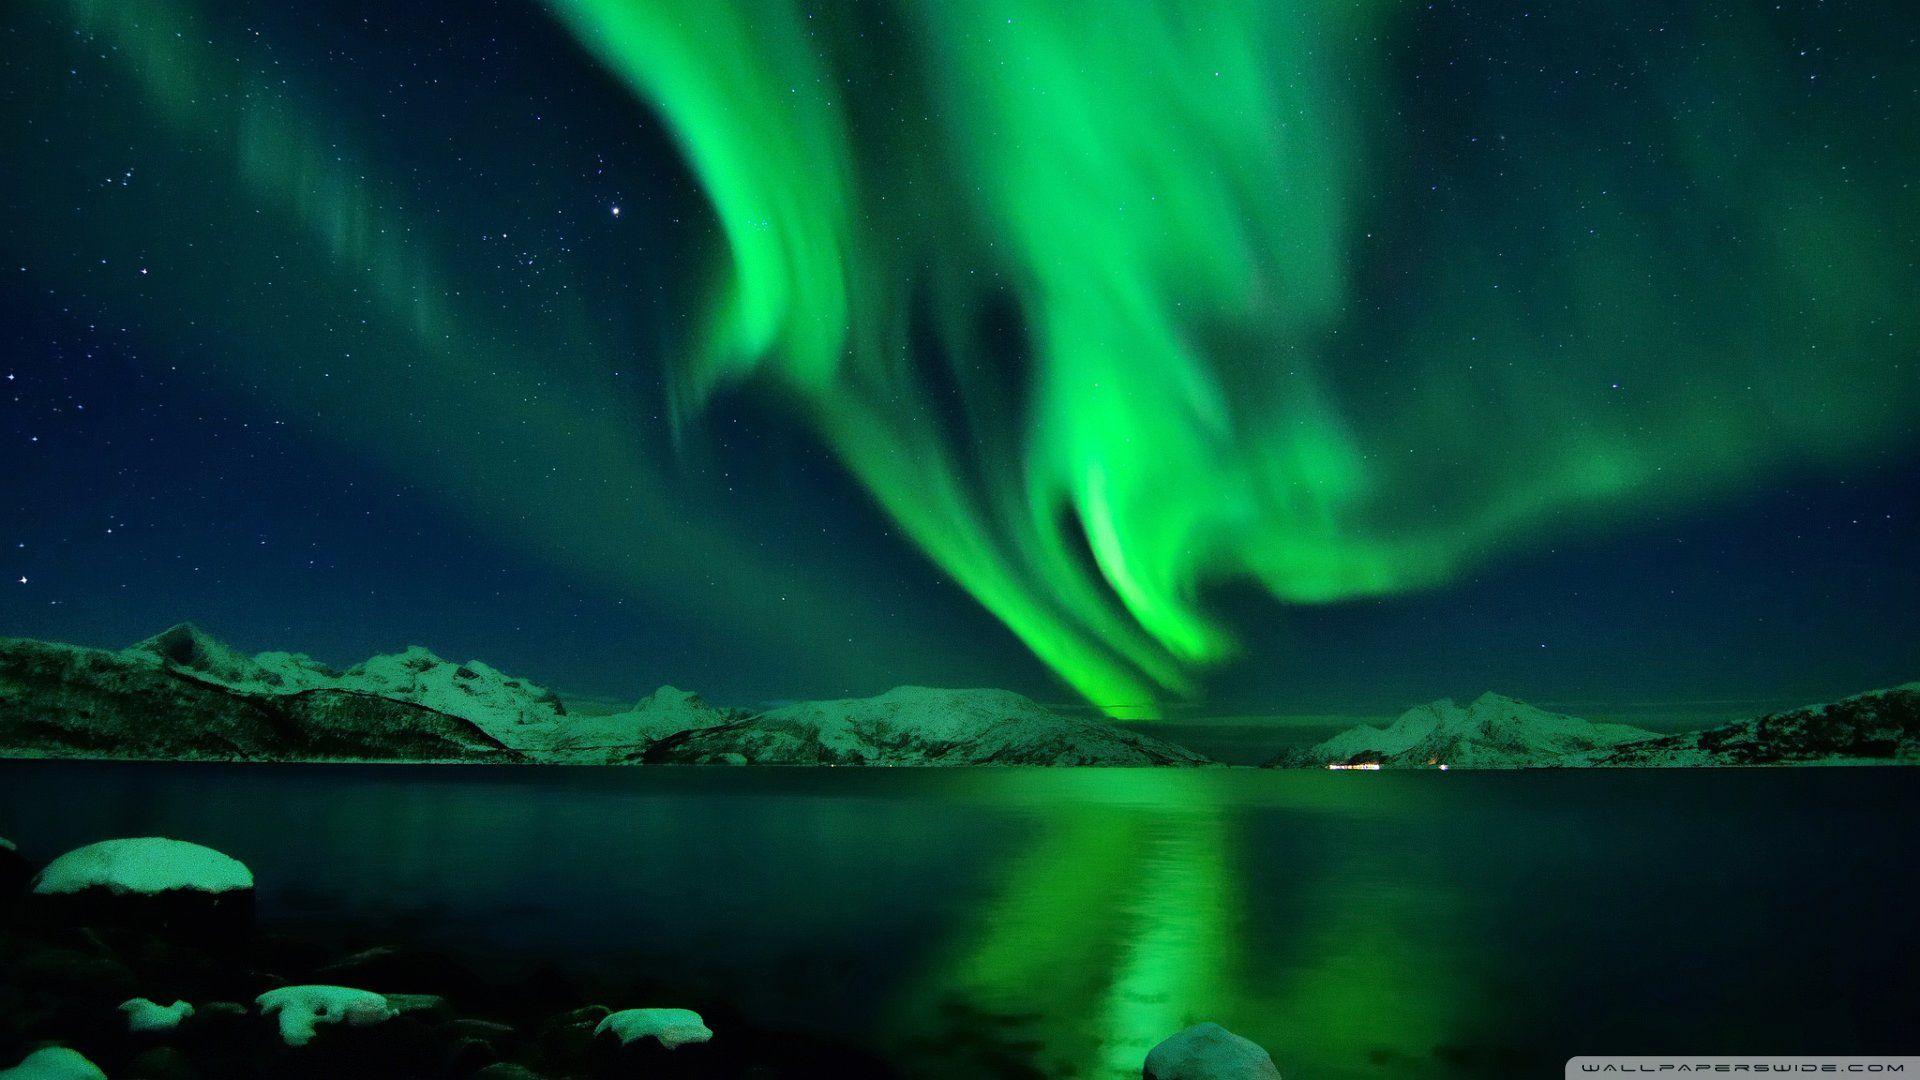 Aurora Green Wallpaper 1920x1080 Jpg 1920 1080 Northern Lights Landscape Pictures World Of Color